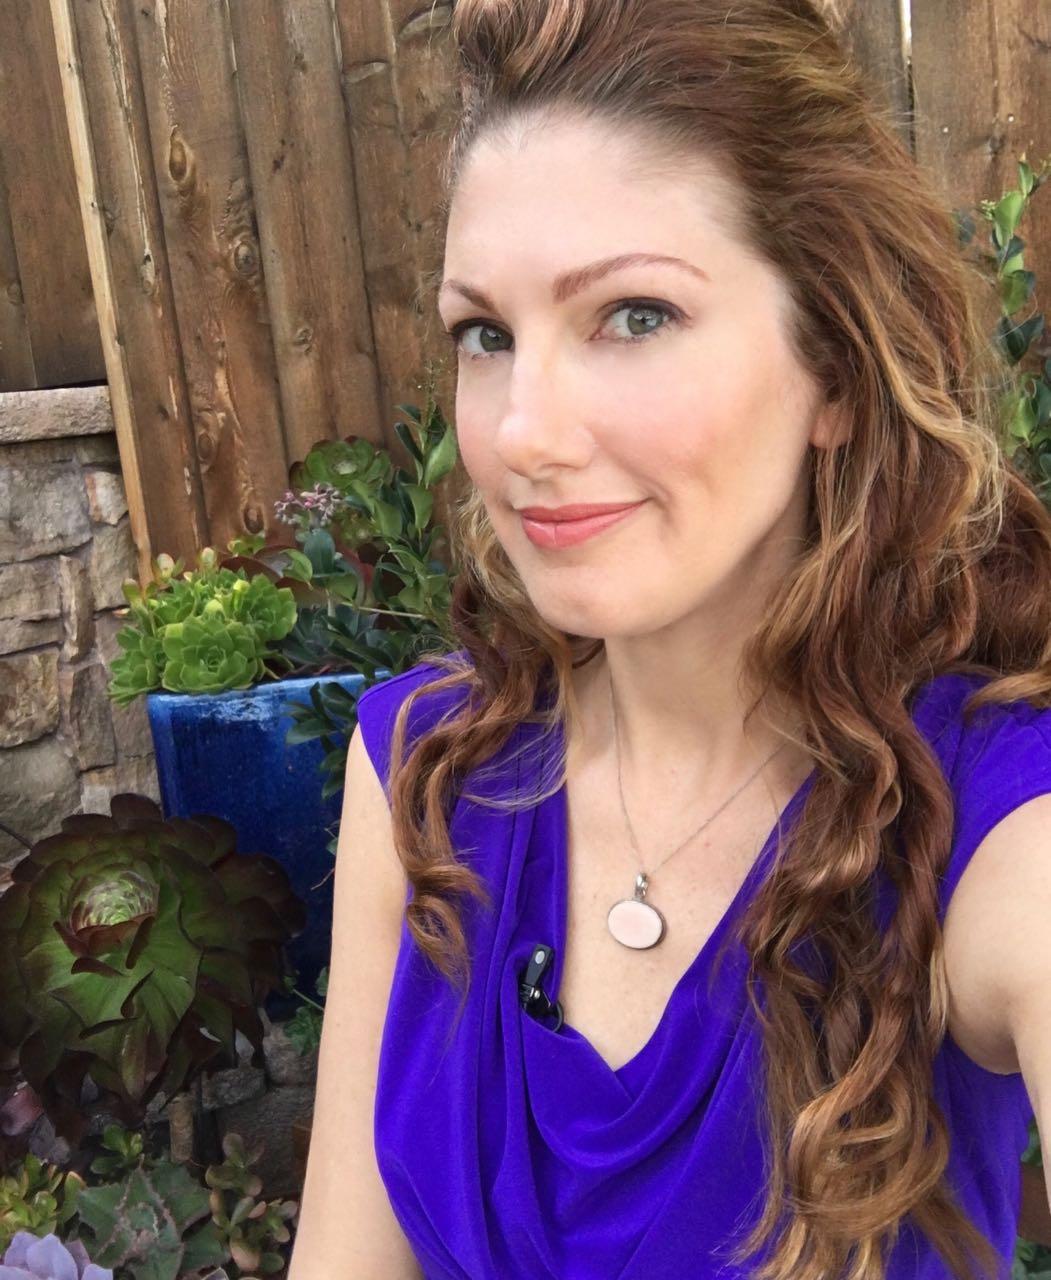 San Diego Mental Health Expert for TV News - Psychotherapist Abby Burd